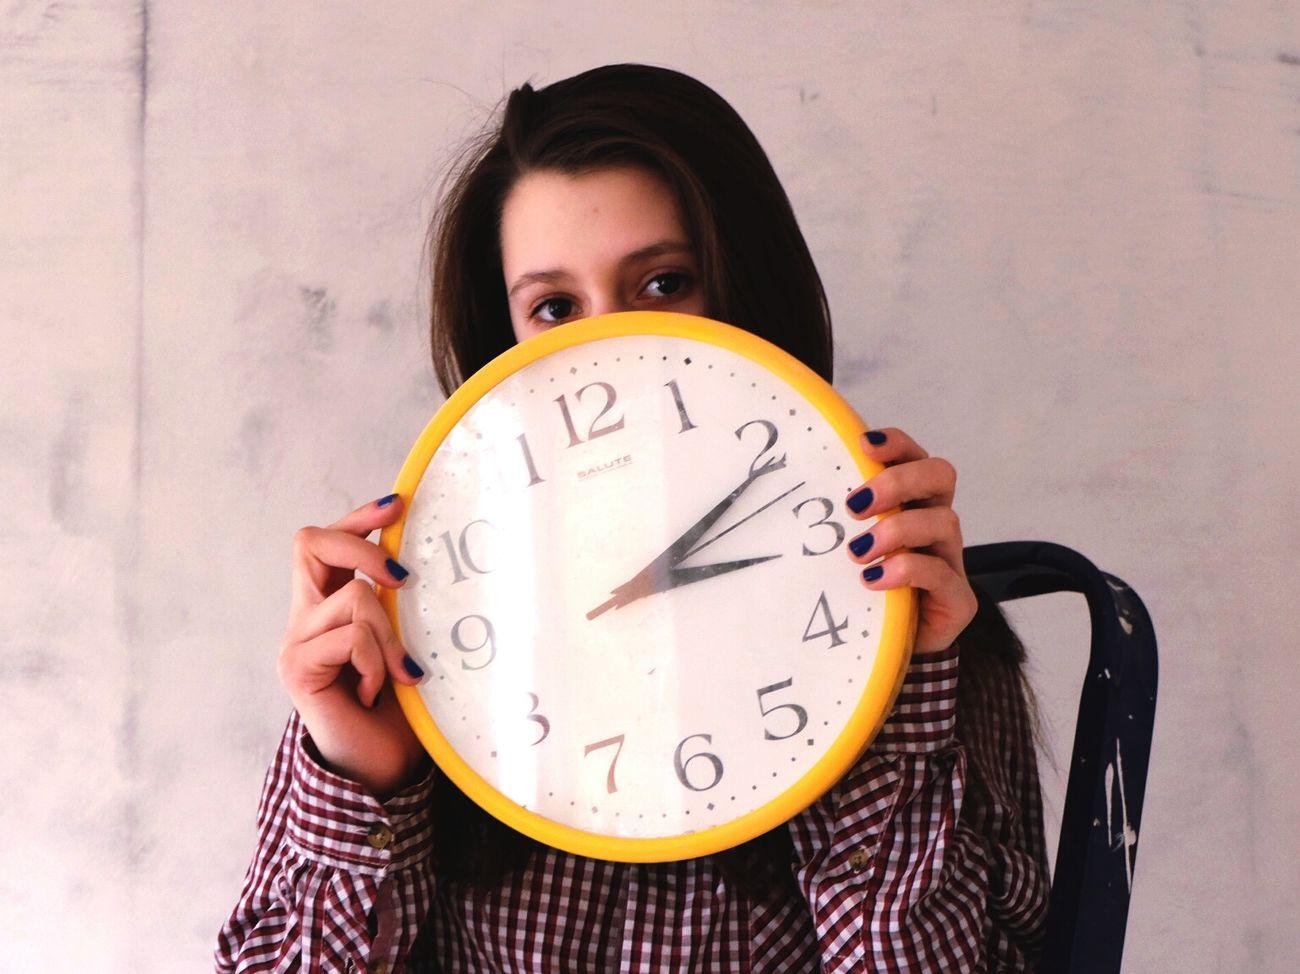 Clockouttime Clock Time Likeforlike Like4like Followme Follow4follow Followback Beautiful